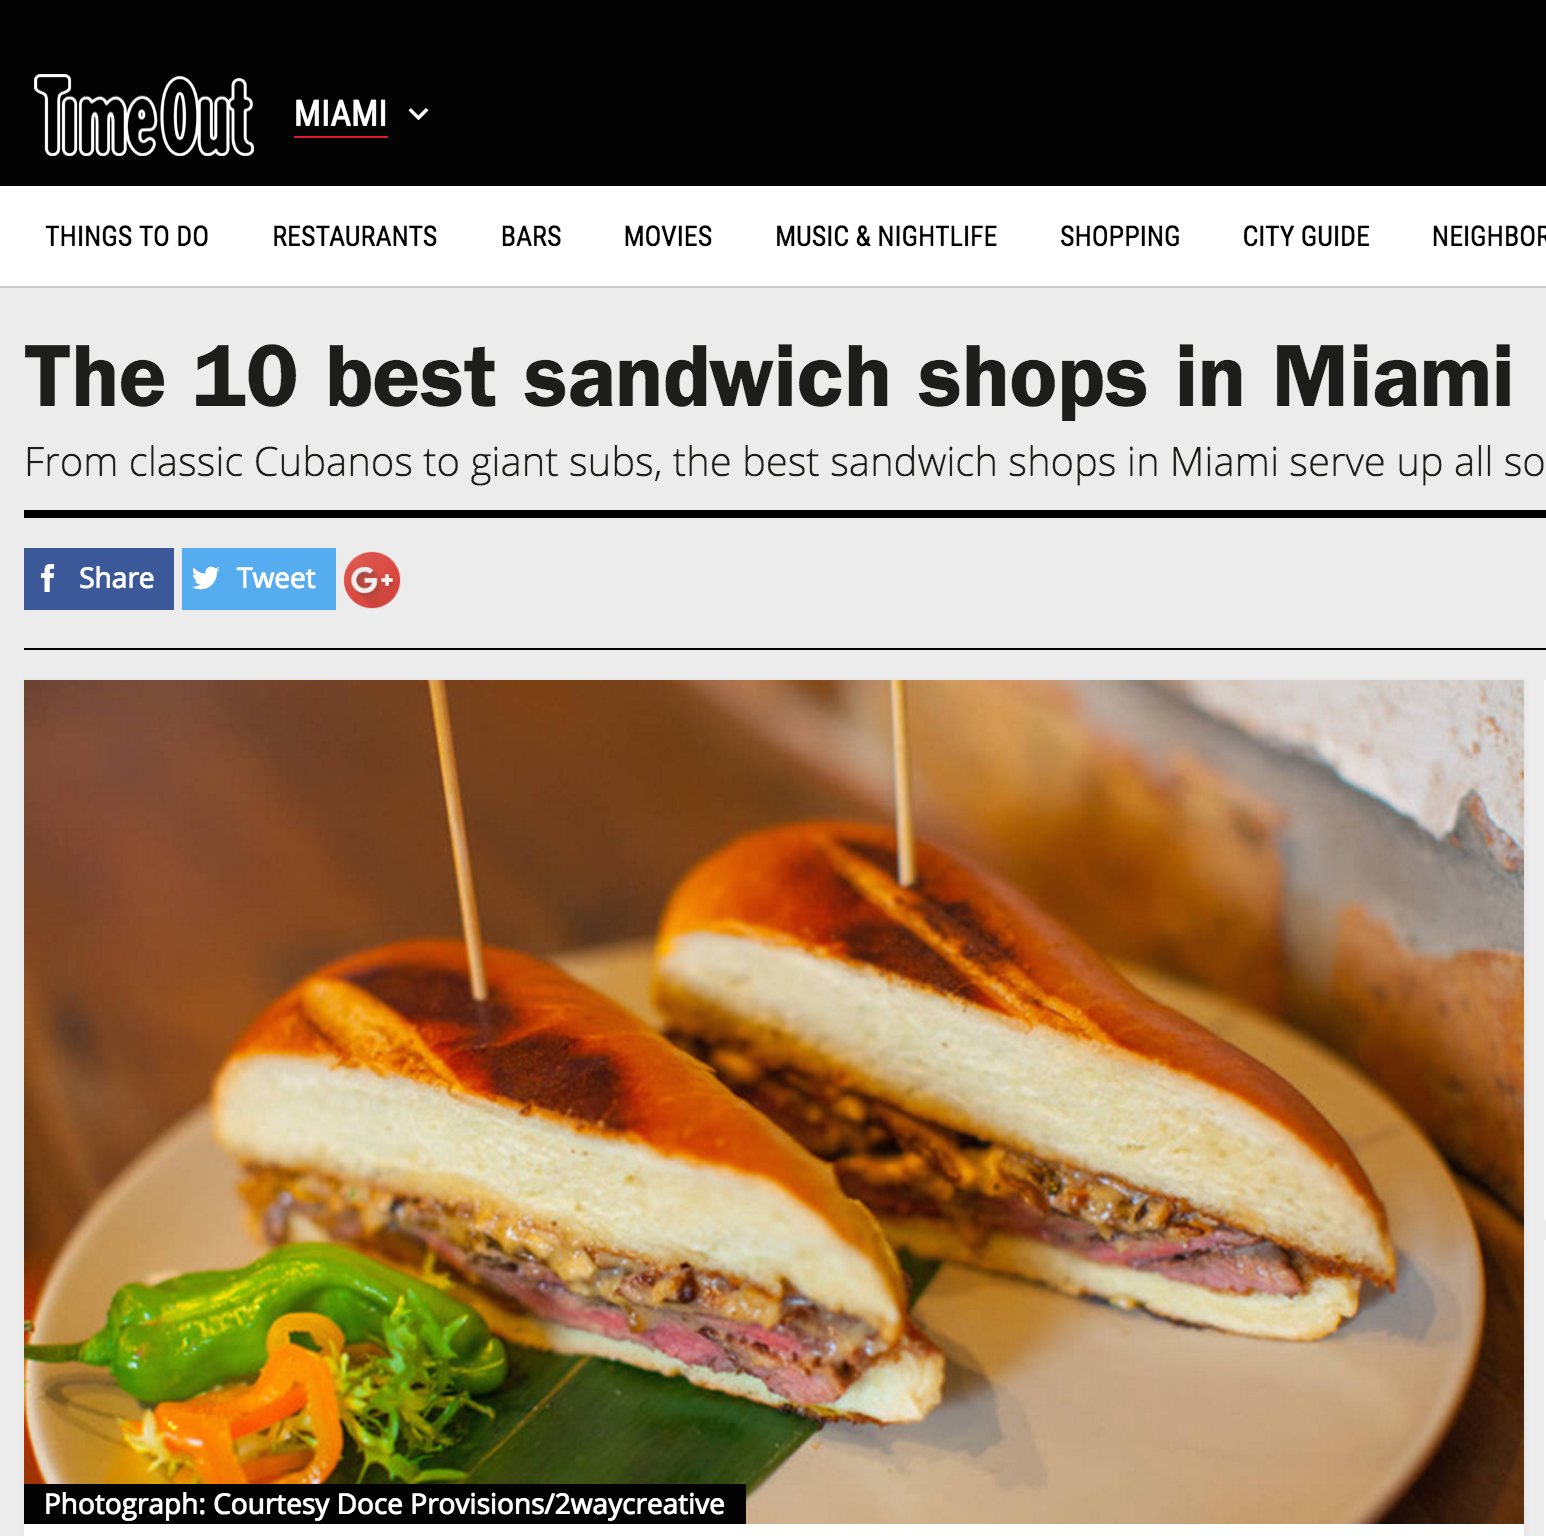 The 10 best sandwich shops in Miami ... READ MORE